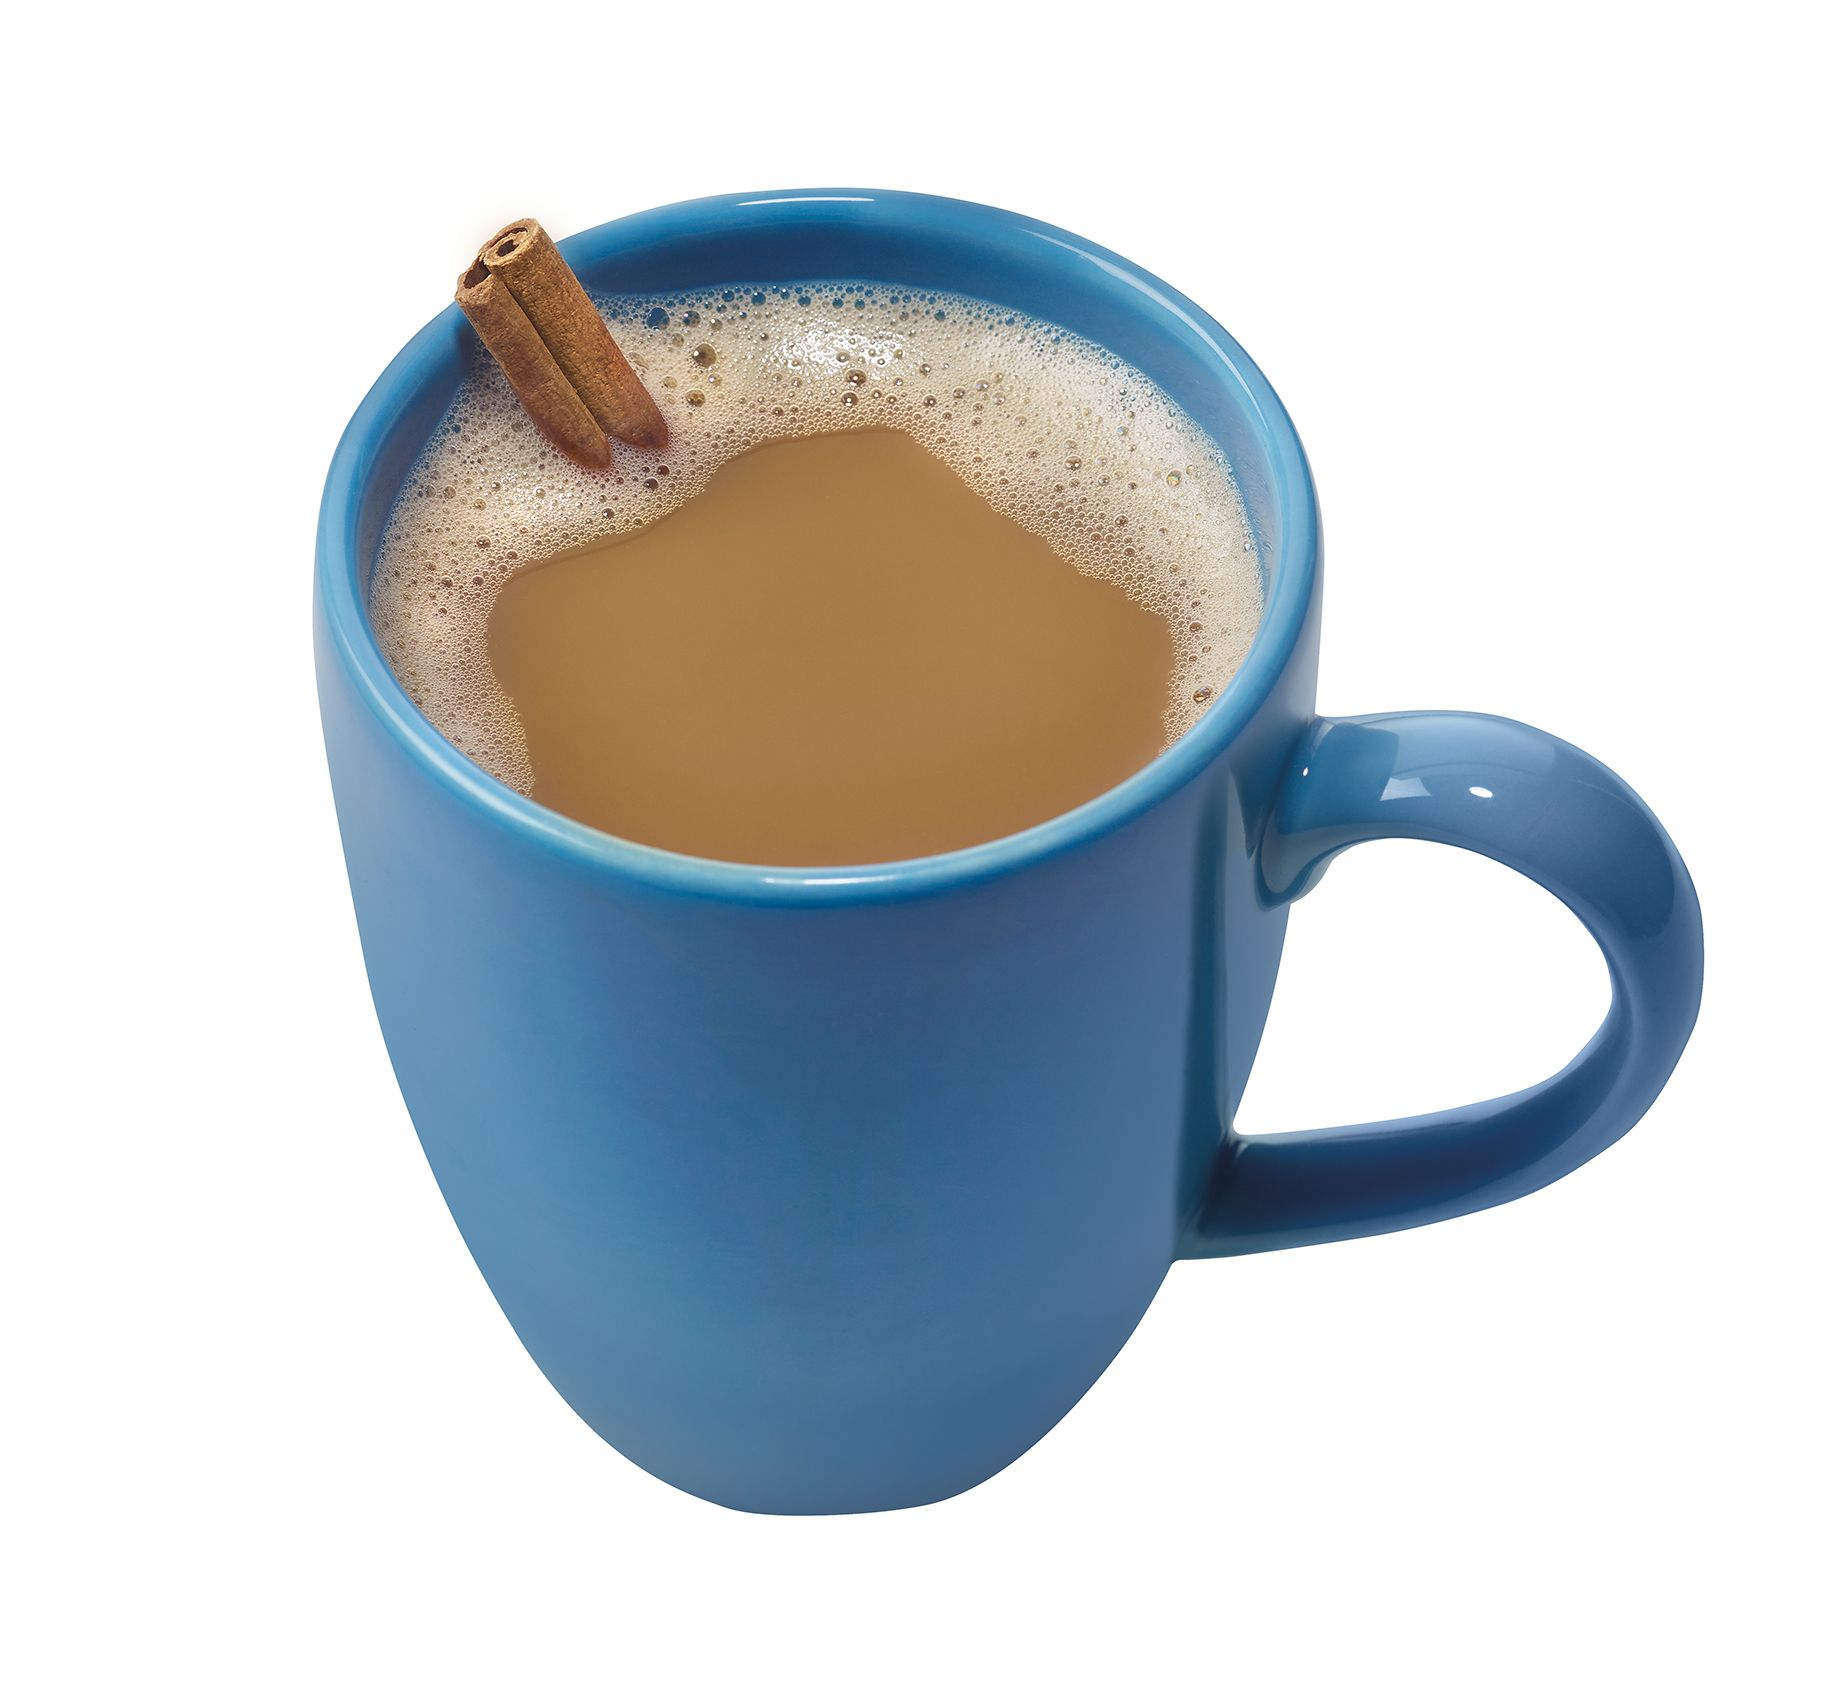 NM2_Cappuccino_Blue-Mug_v3.jpg